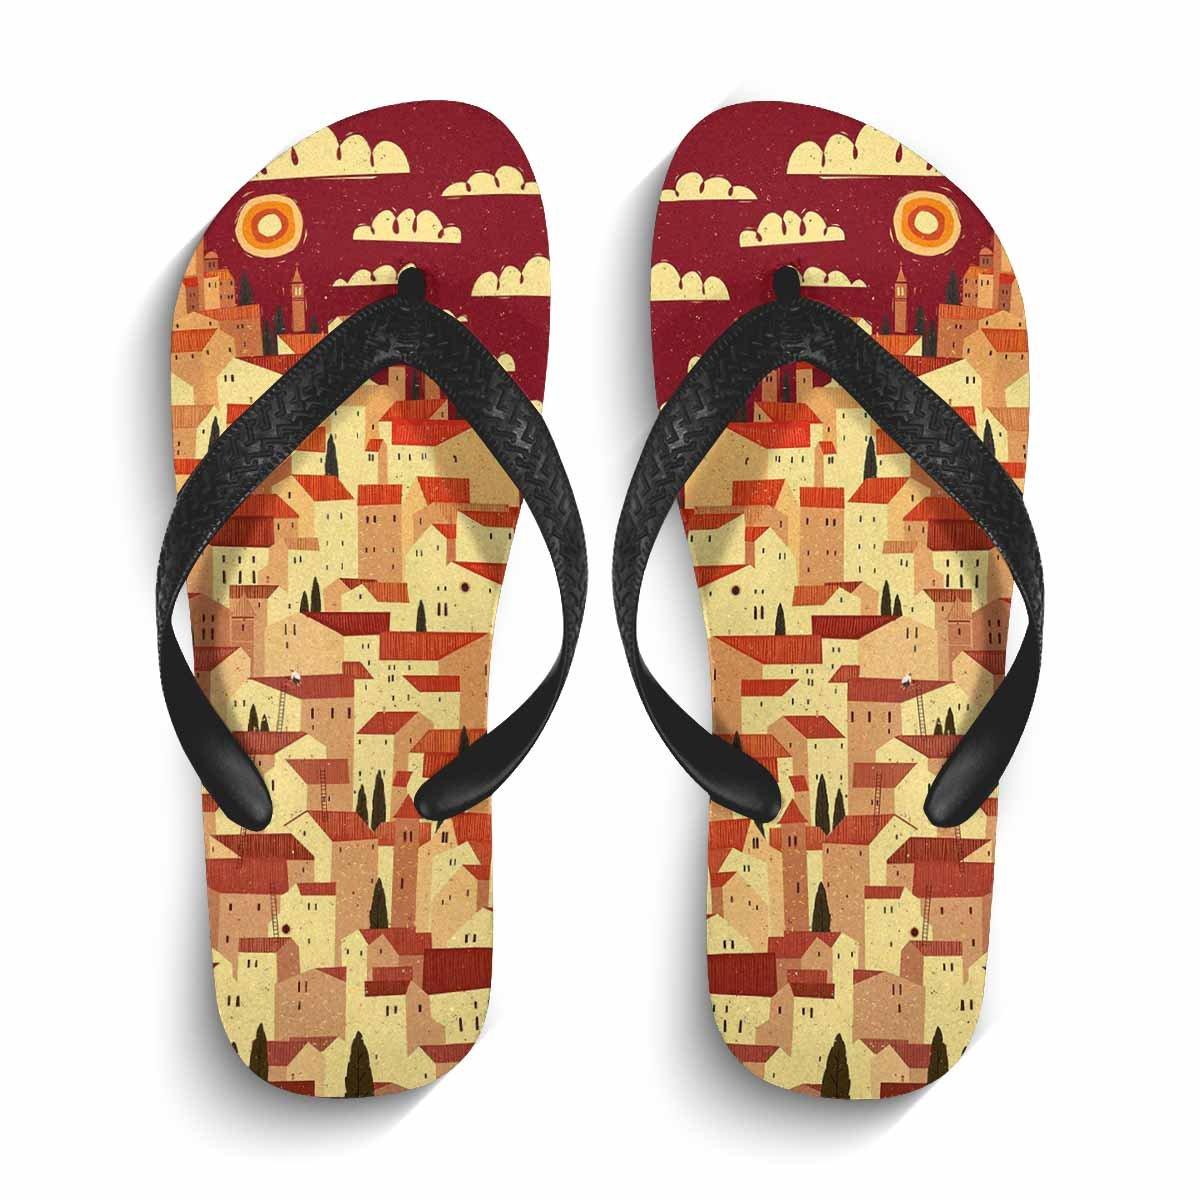 Chad Hope Womens Beach Flip Flops Summer Flip Flop Sandals /& Slippers,Comfortable Beach shoes